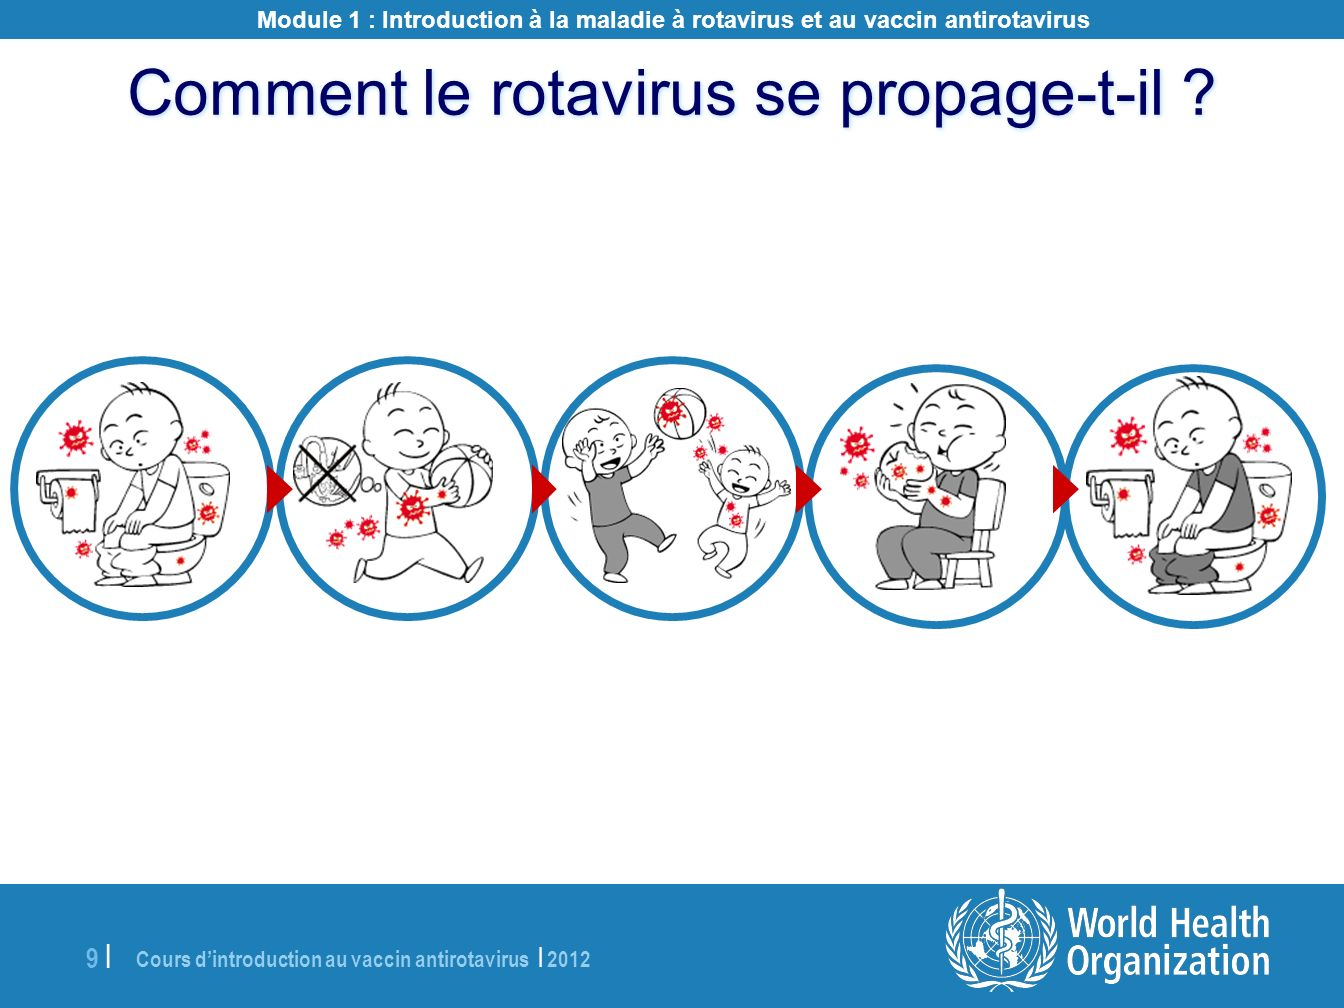 Comment le rotavirus se propage-t-il